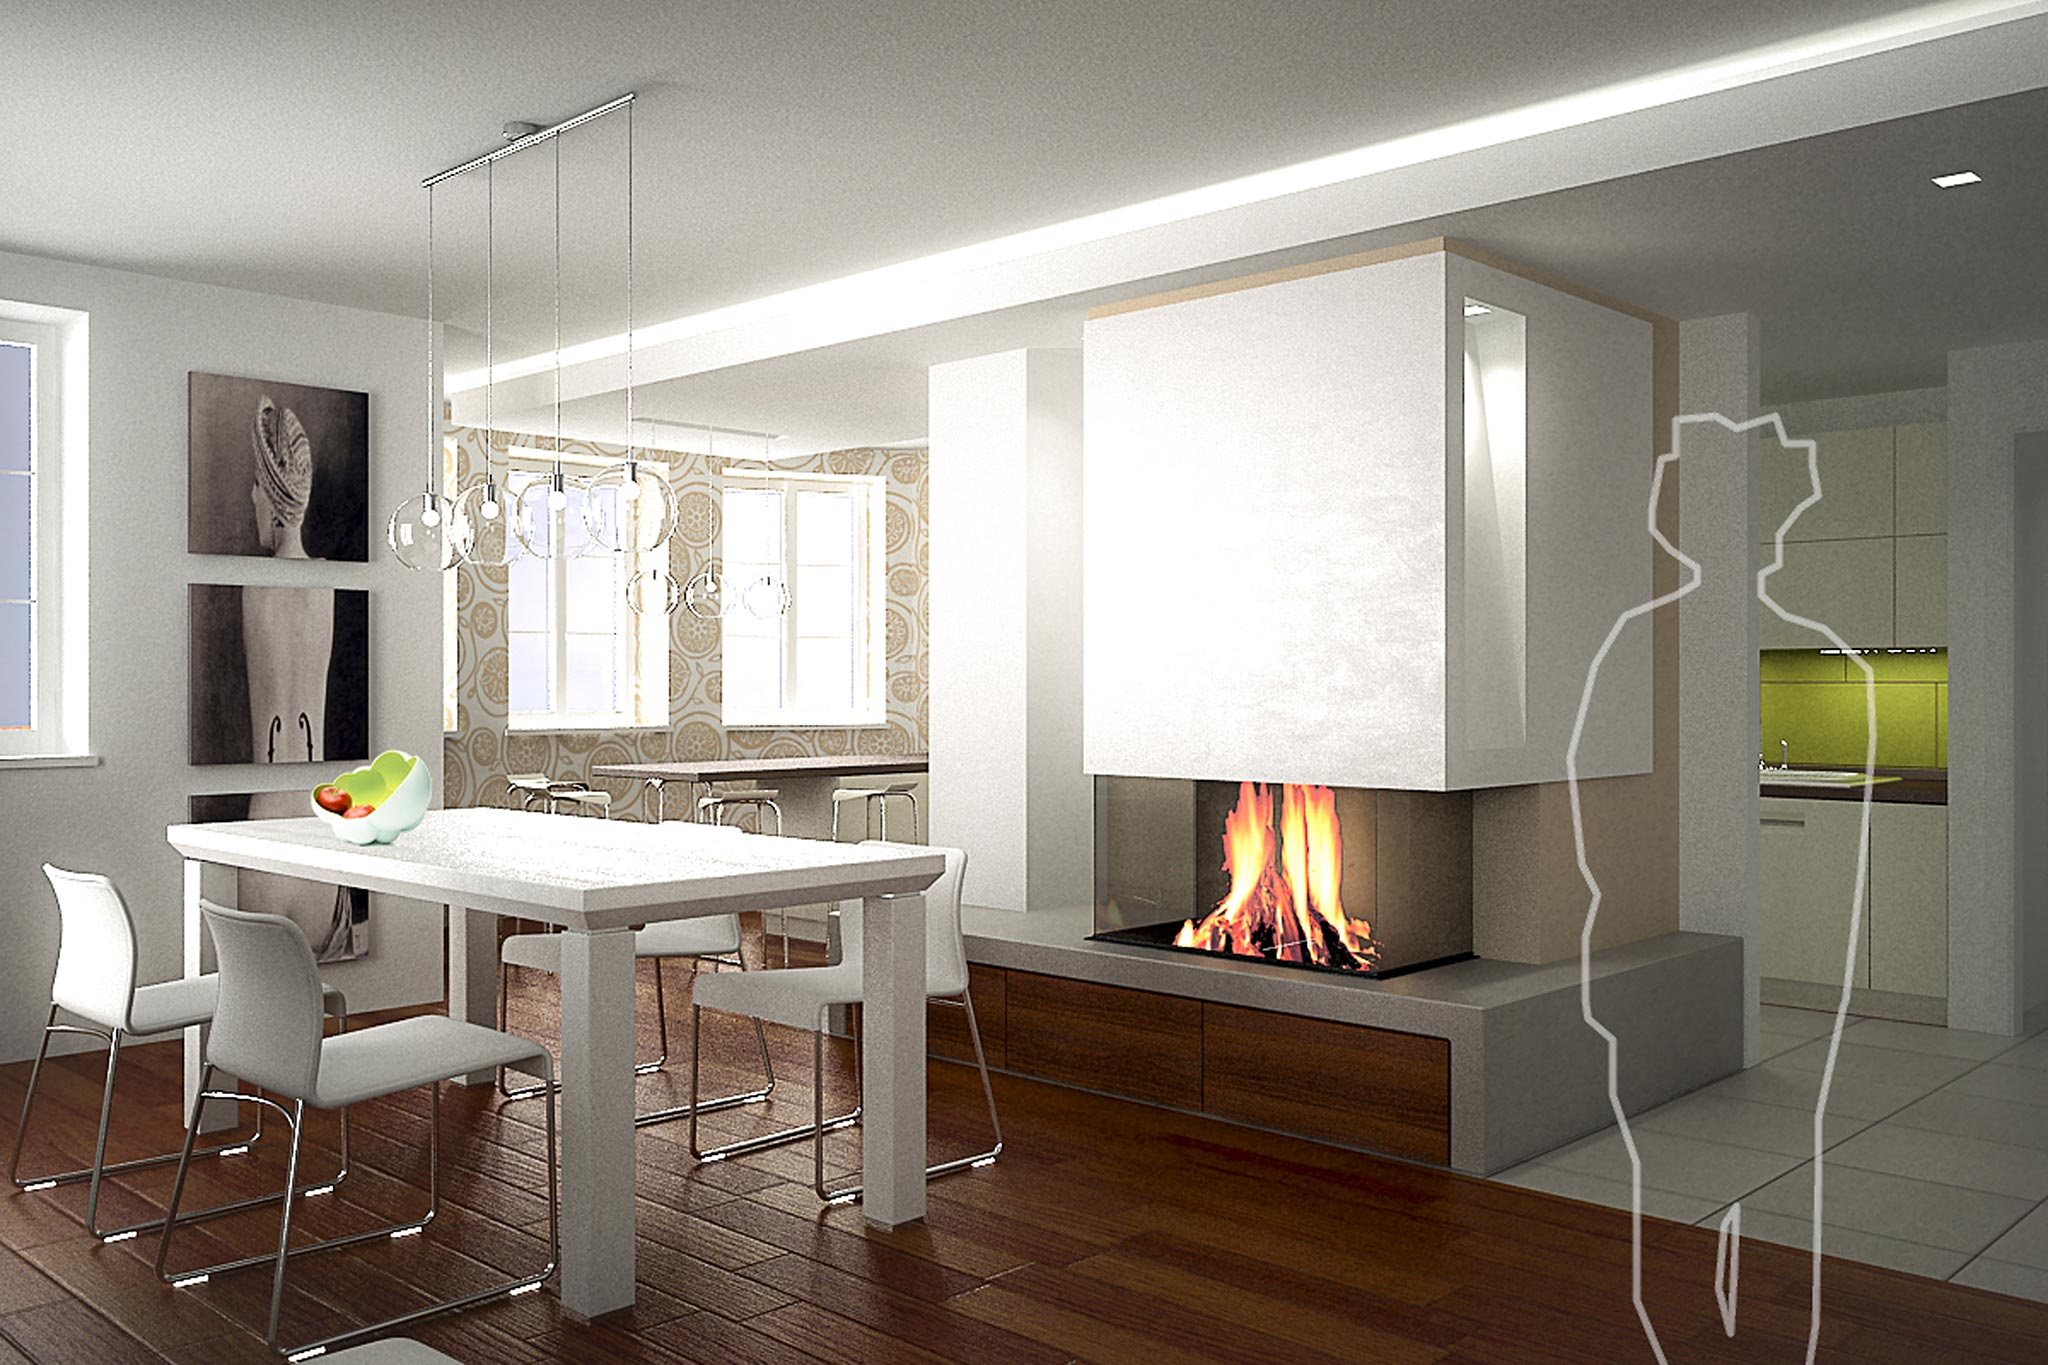 Interior Design in Trentino